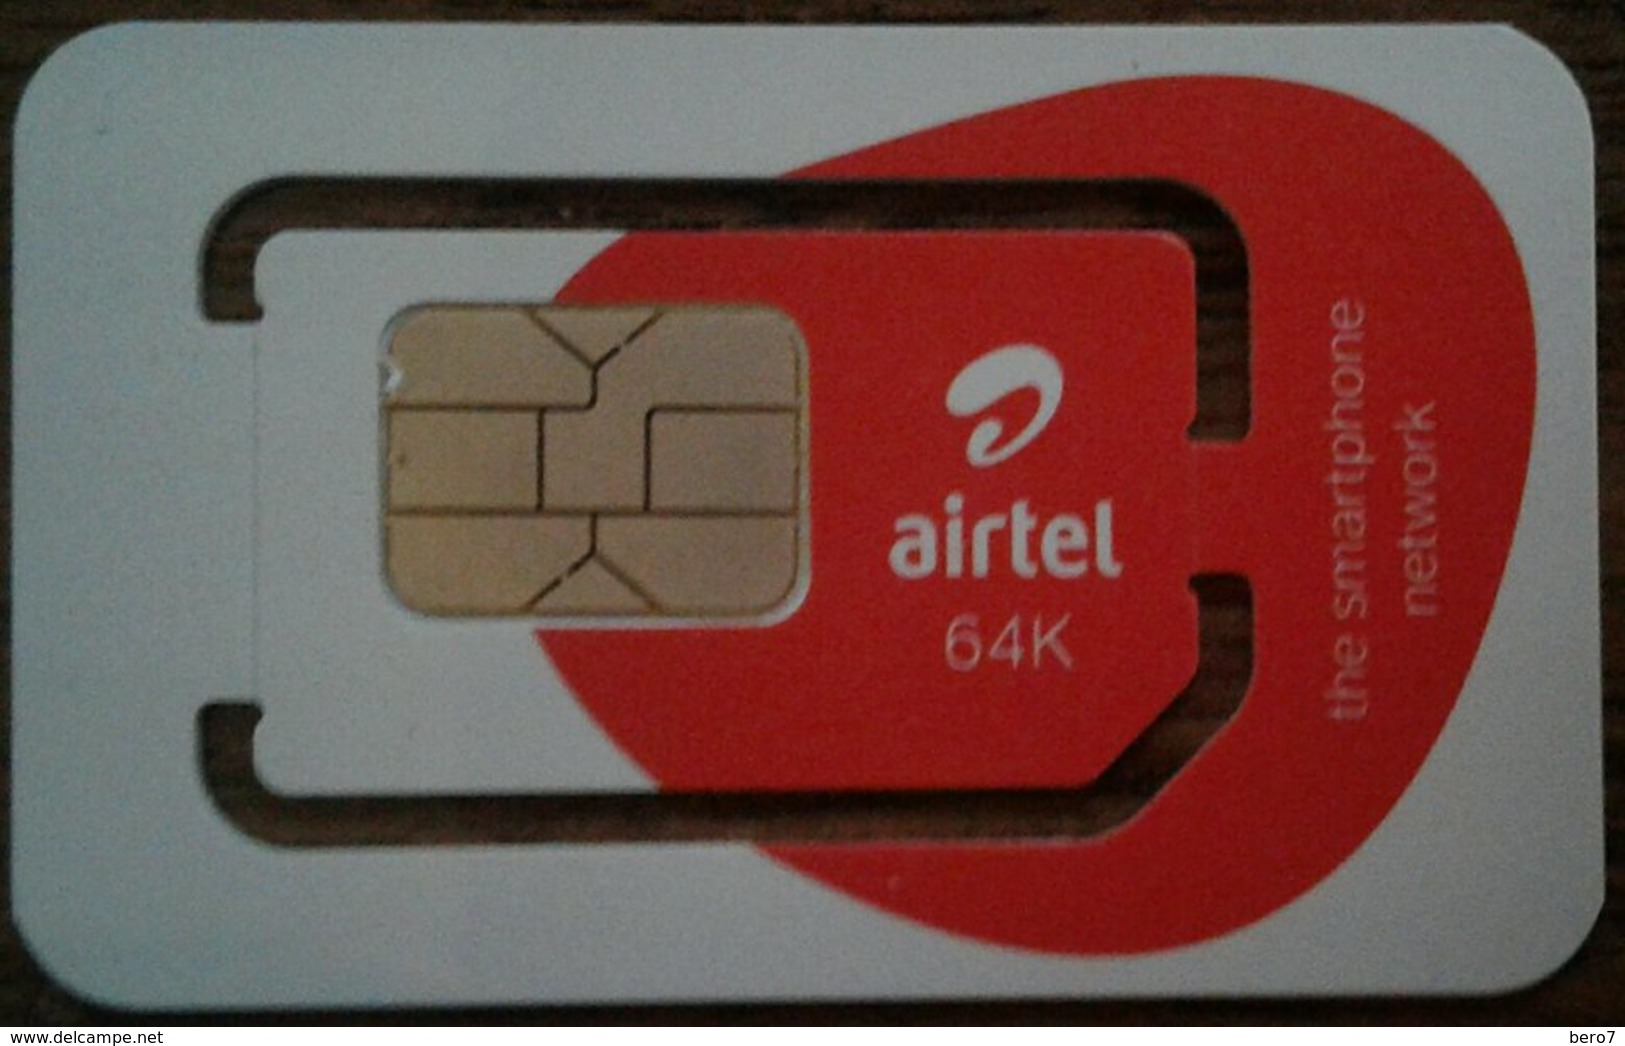 Airtel 64K Mobile Rwanda (AFRICA) GSM SIM - Rwanda